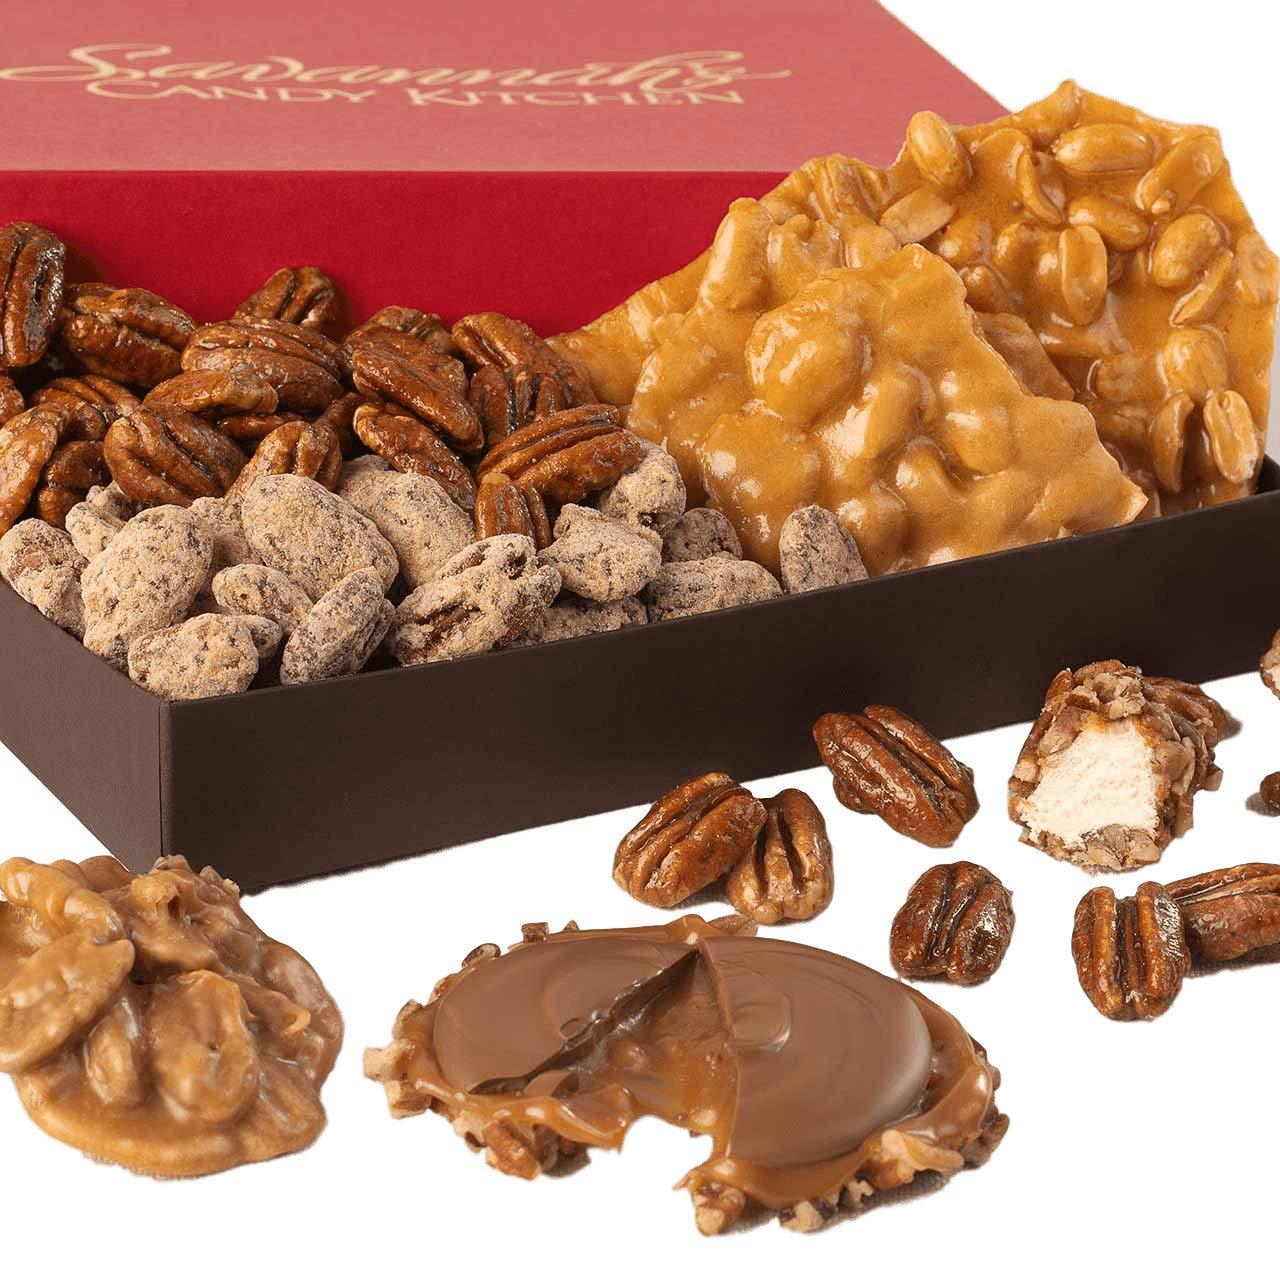 CDM product Handmade Southern Confections Gourmet Gift Box - Praline, Chocolate Caramel Pecan Turtle Gophers, Pecan Nougat Caramel Log Roll, Handmade Peanut Brittle, Candied Pecans | Savannah Candy Kitchen big image